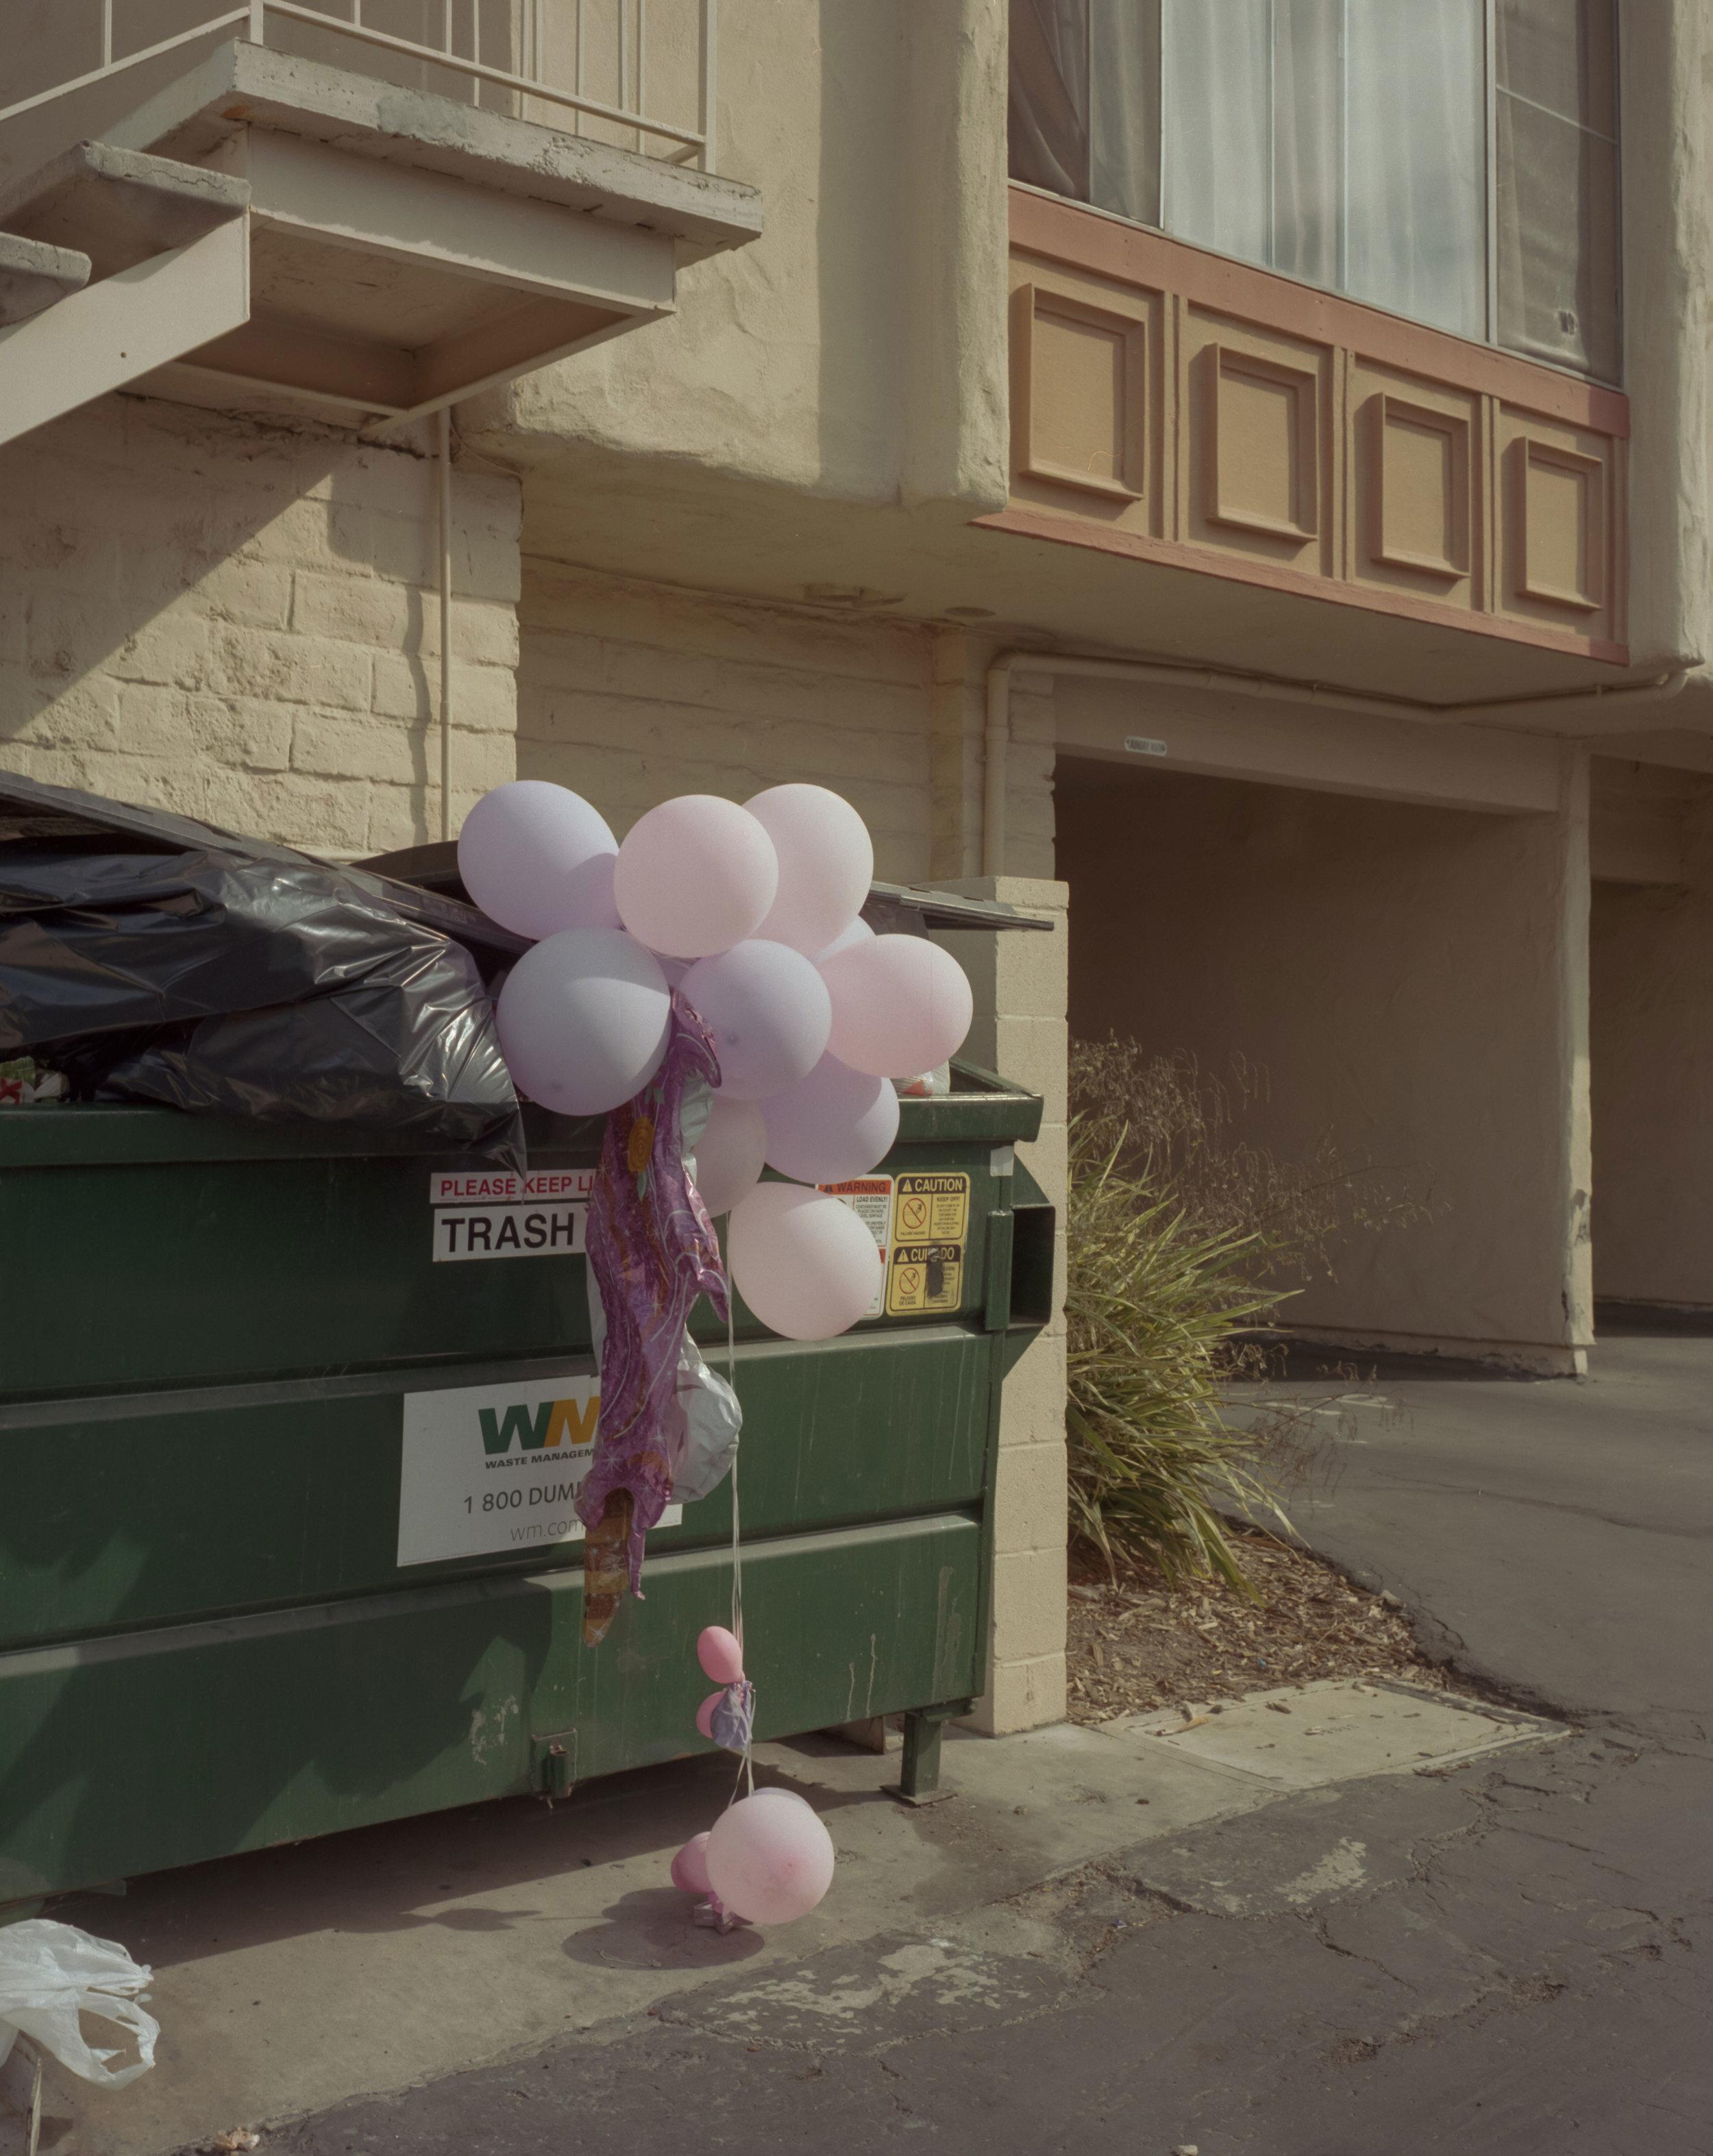 ghostfaceballoons.jpg